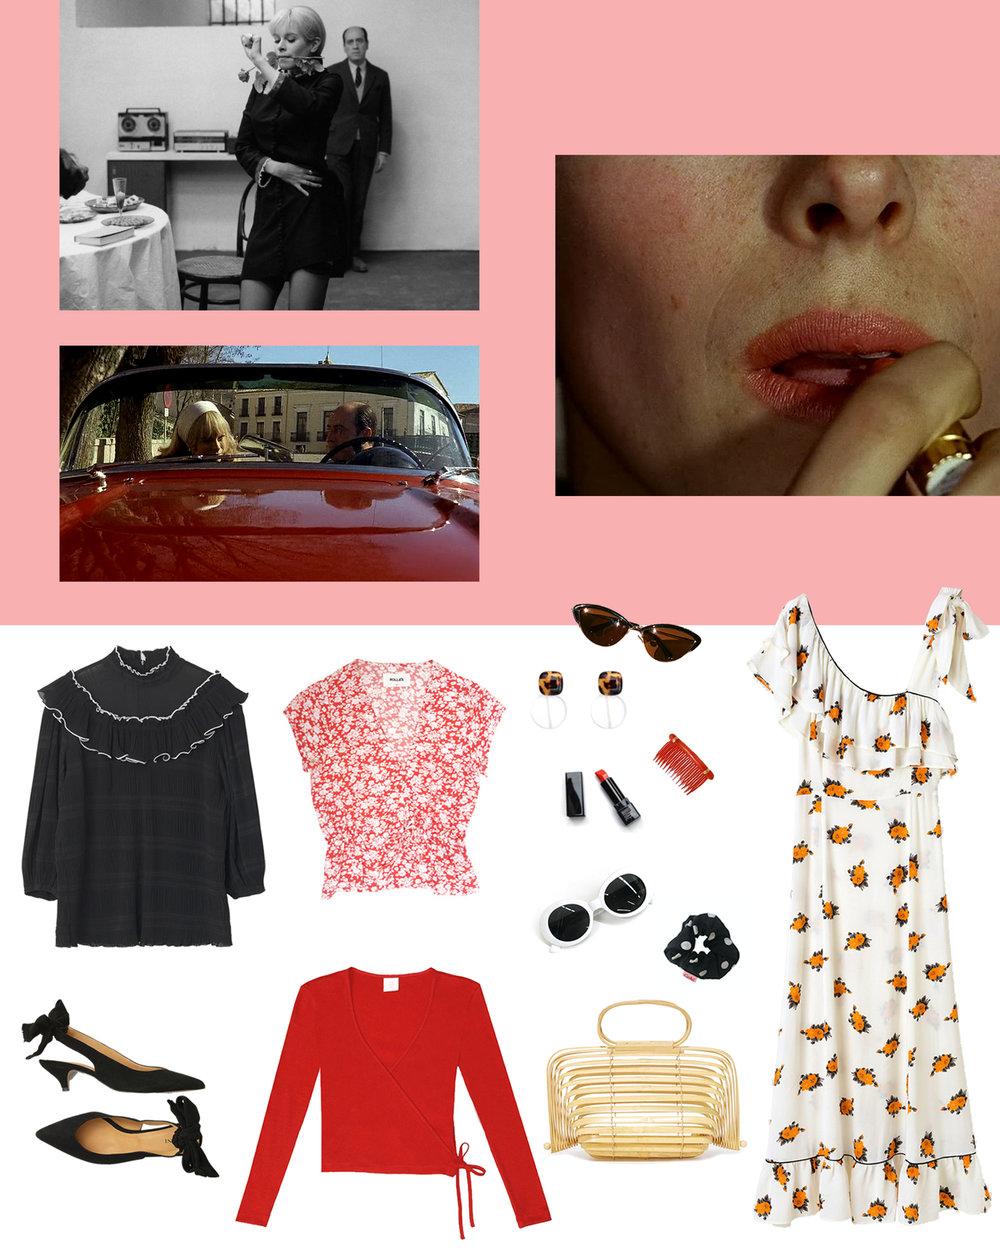 Lisa-Says-Gah-FilmFriday-Peppermint-Frappe-Collage.jpg